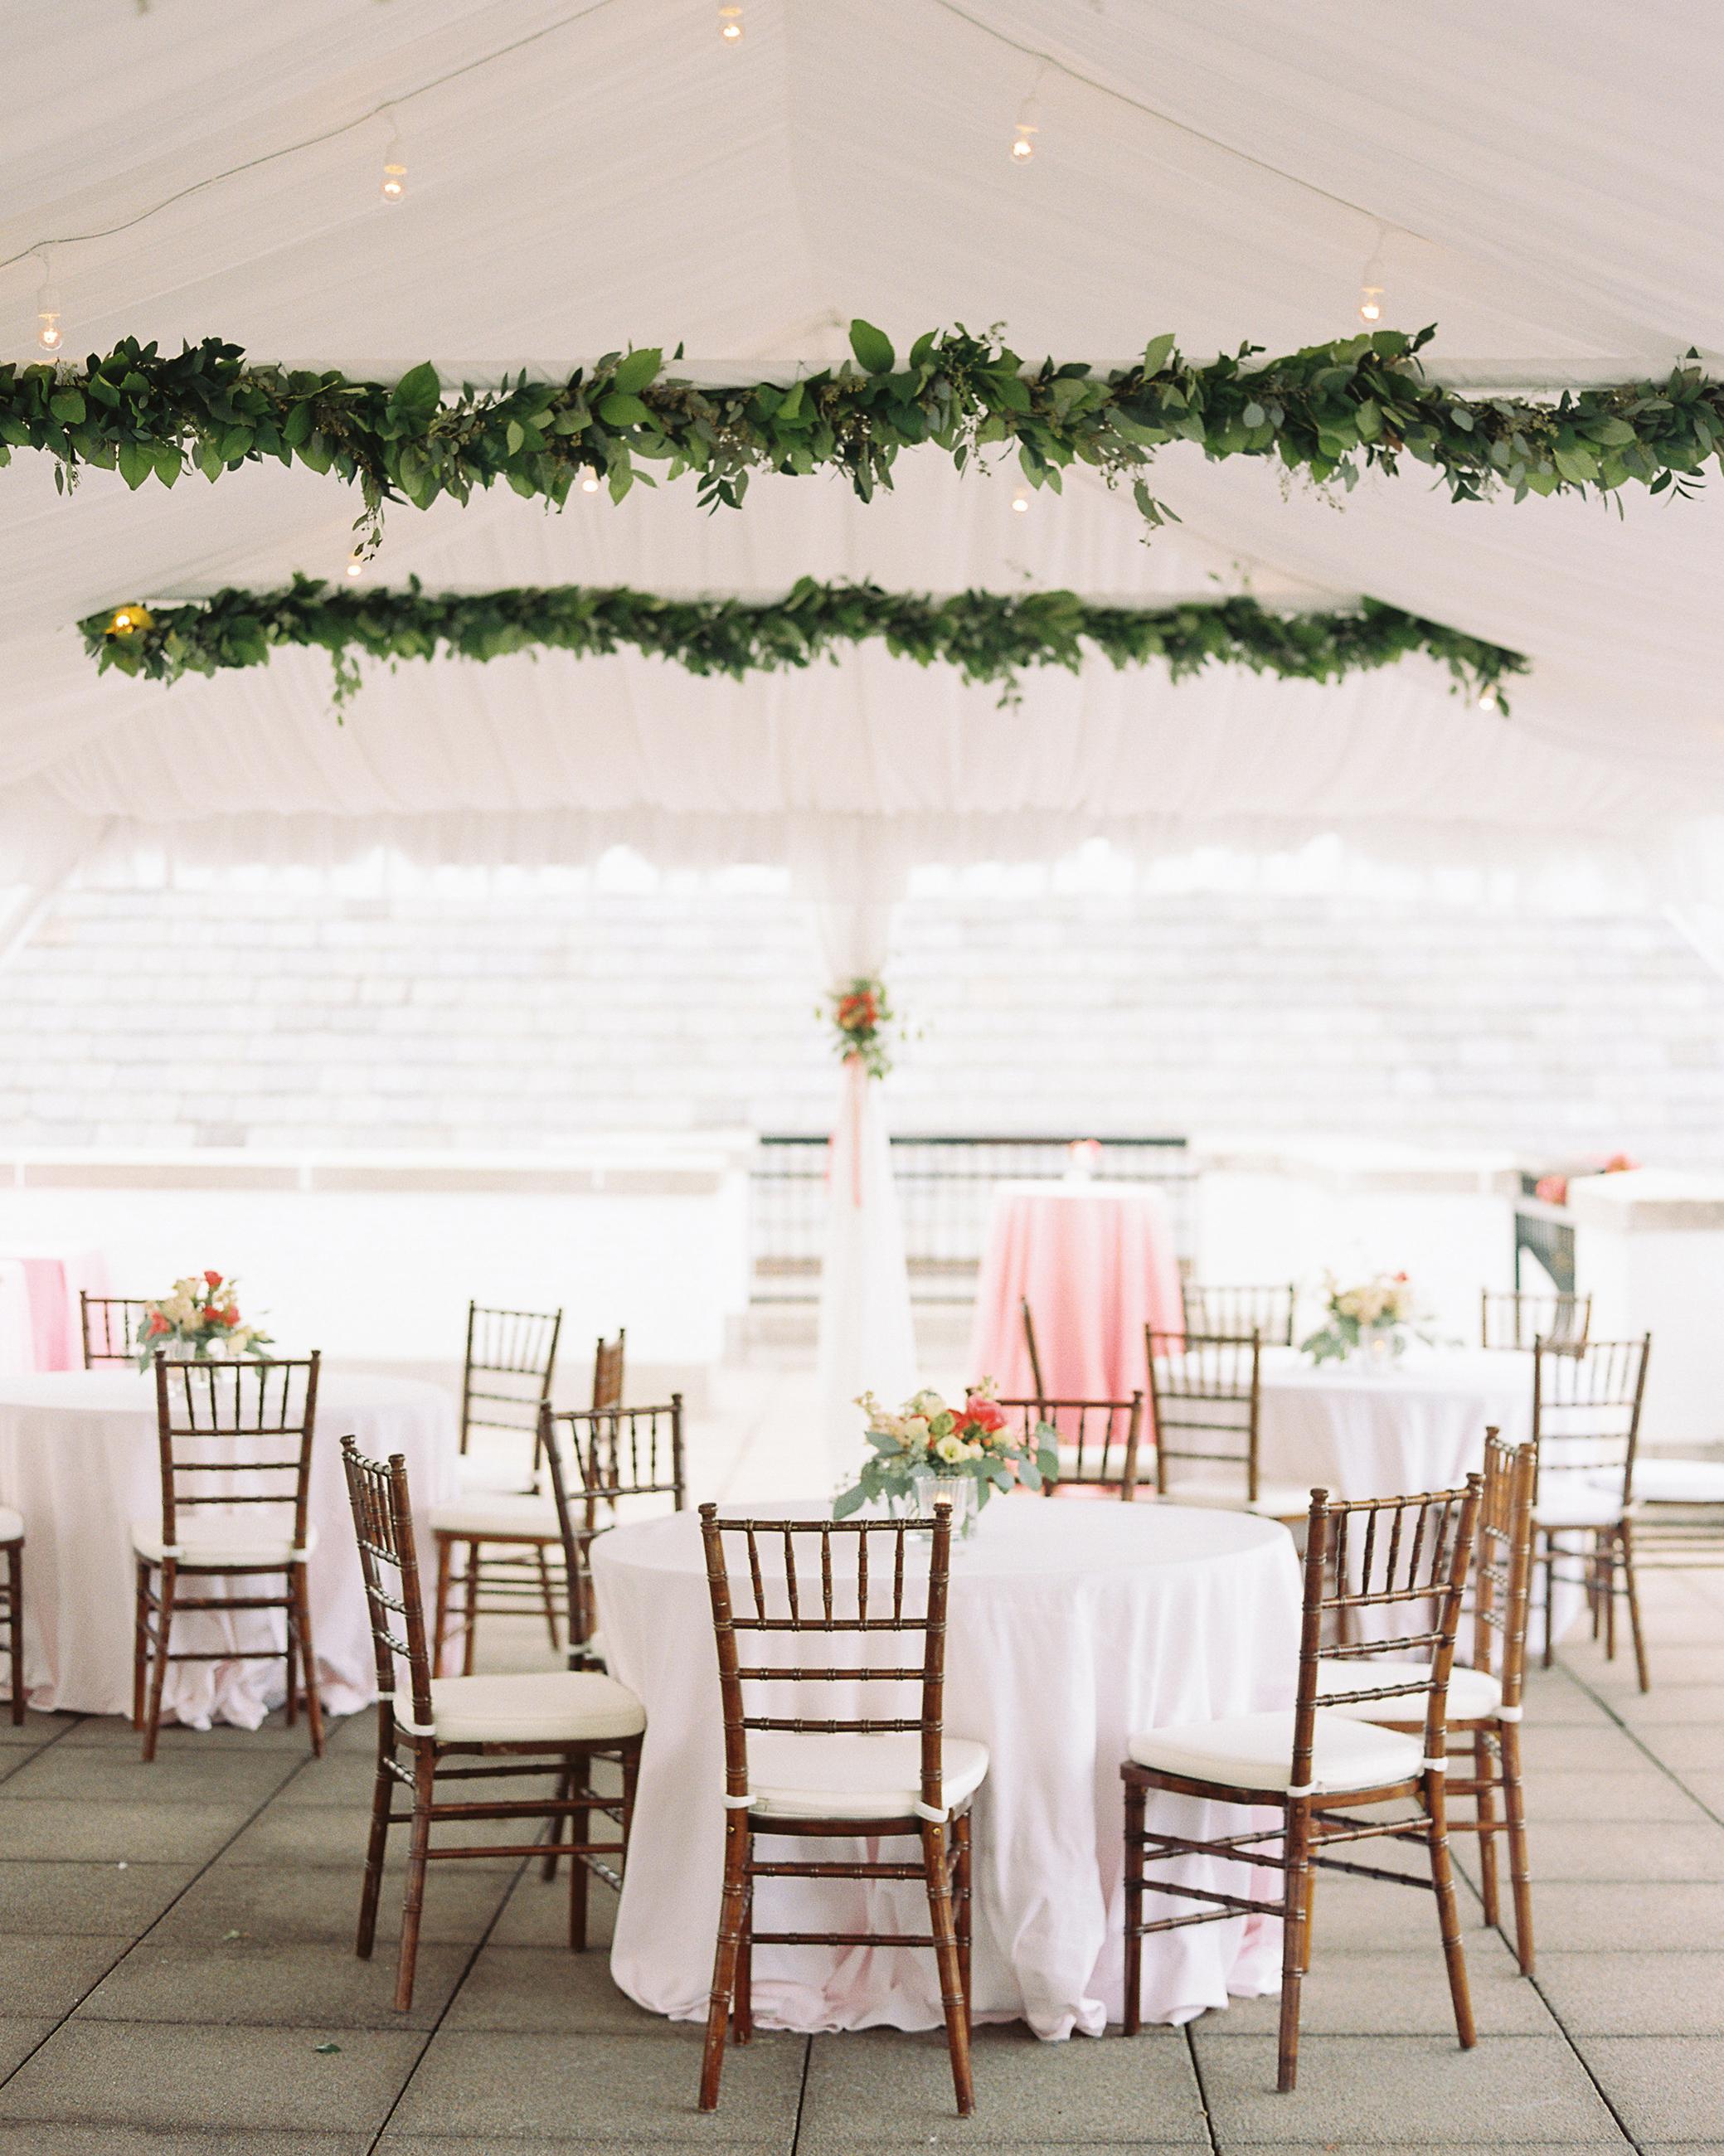 molly-patrick-wedding-reception-3004-s111760-0115.jpg